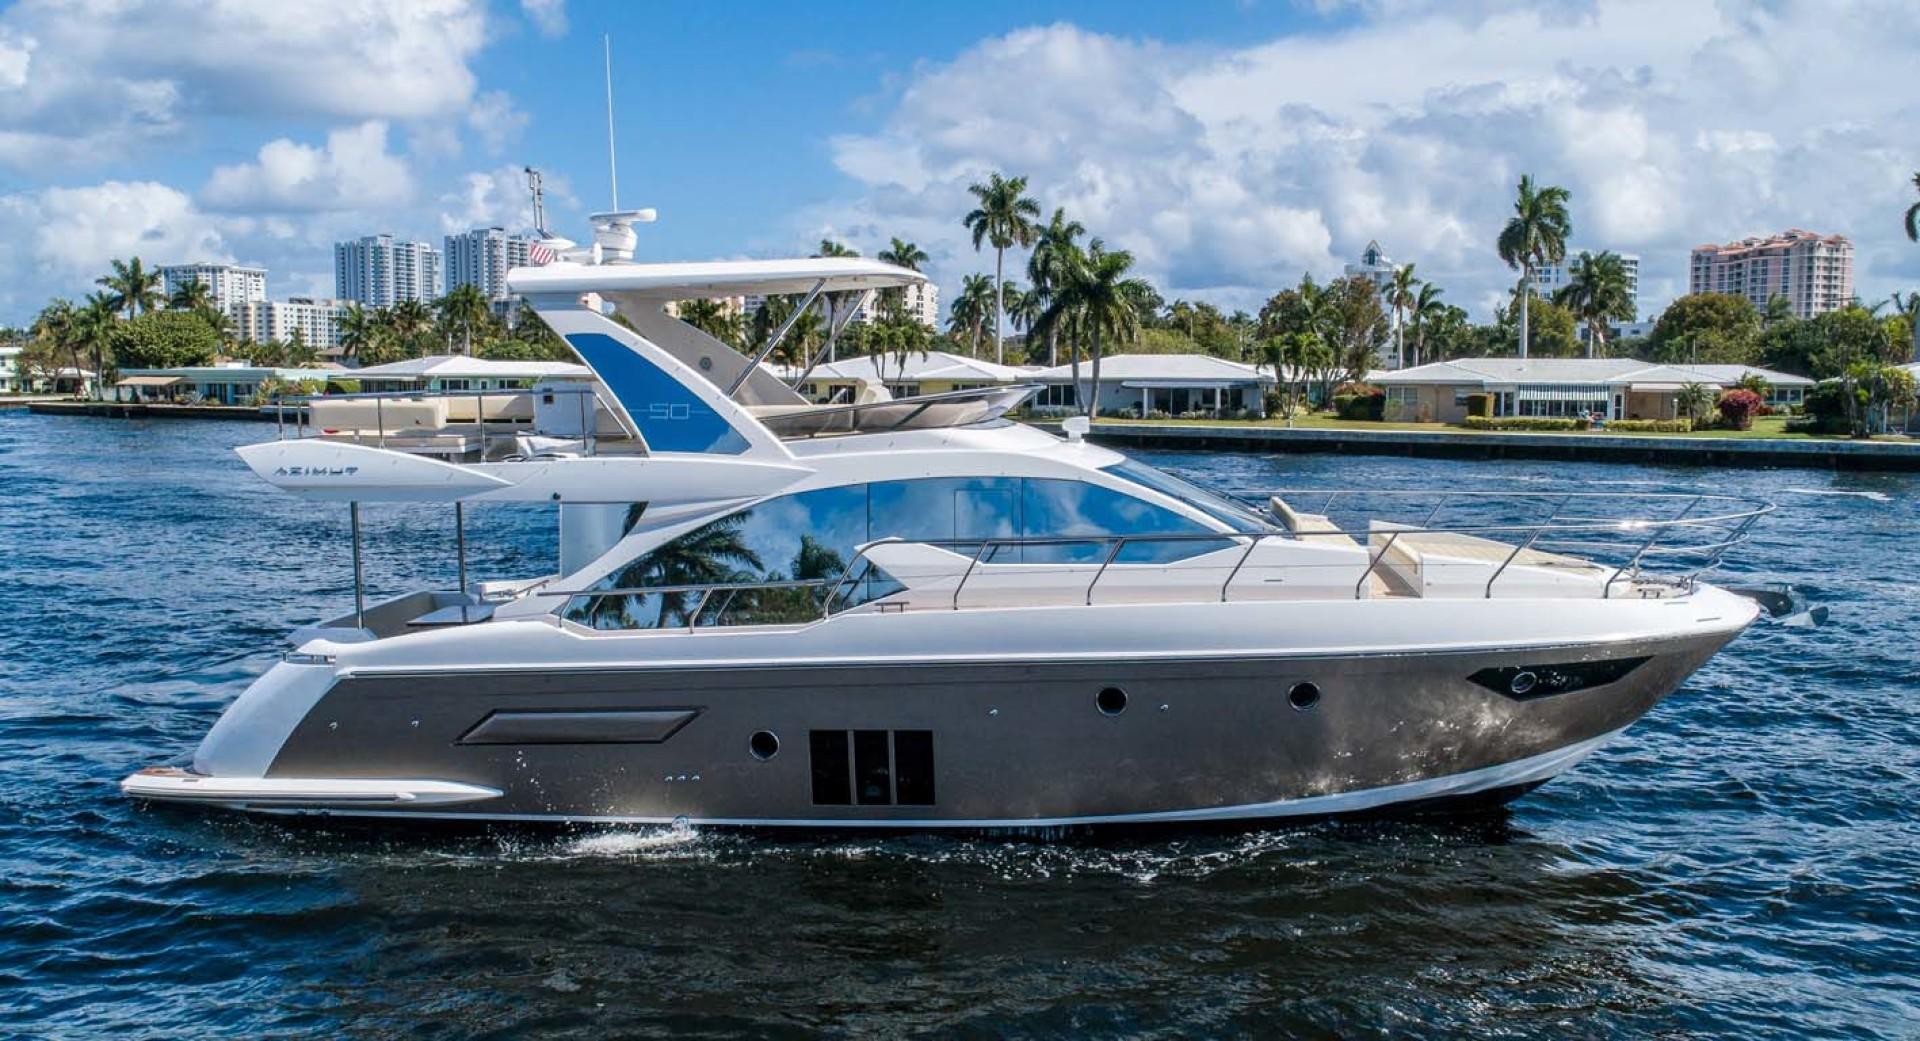 Azimut-50 Flybridge 2016-JET PRIVÉ Fort Lauderdale-Florida-United States-Starboard Profile-1116386 | Thumbnail